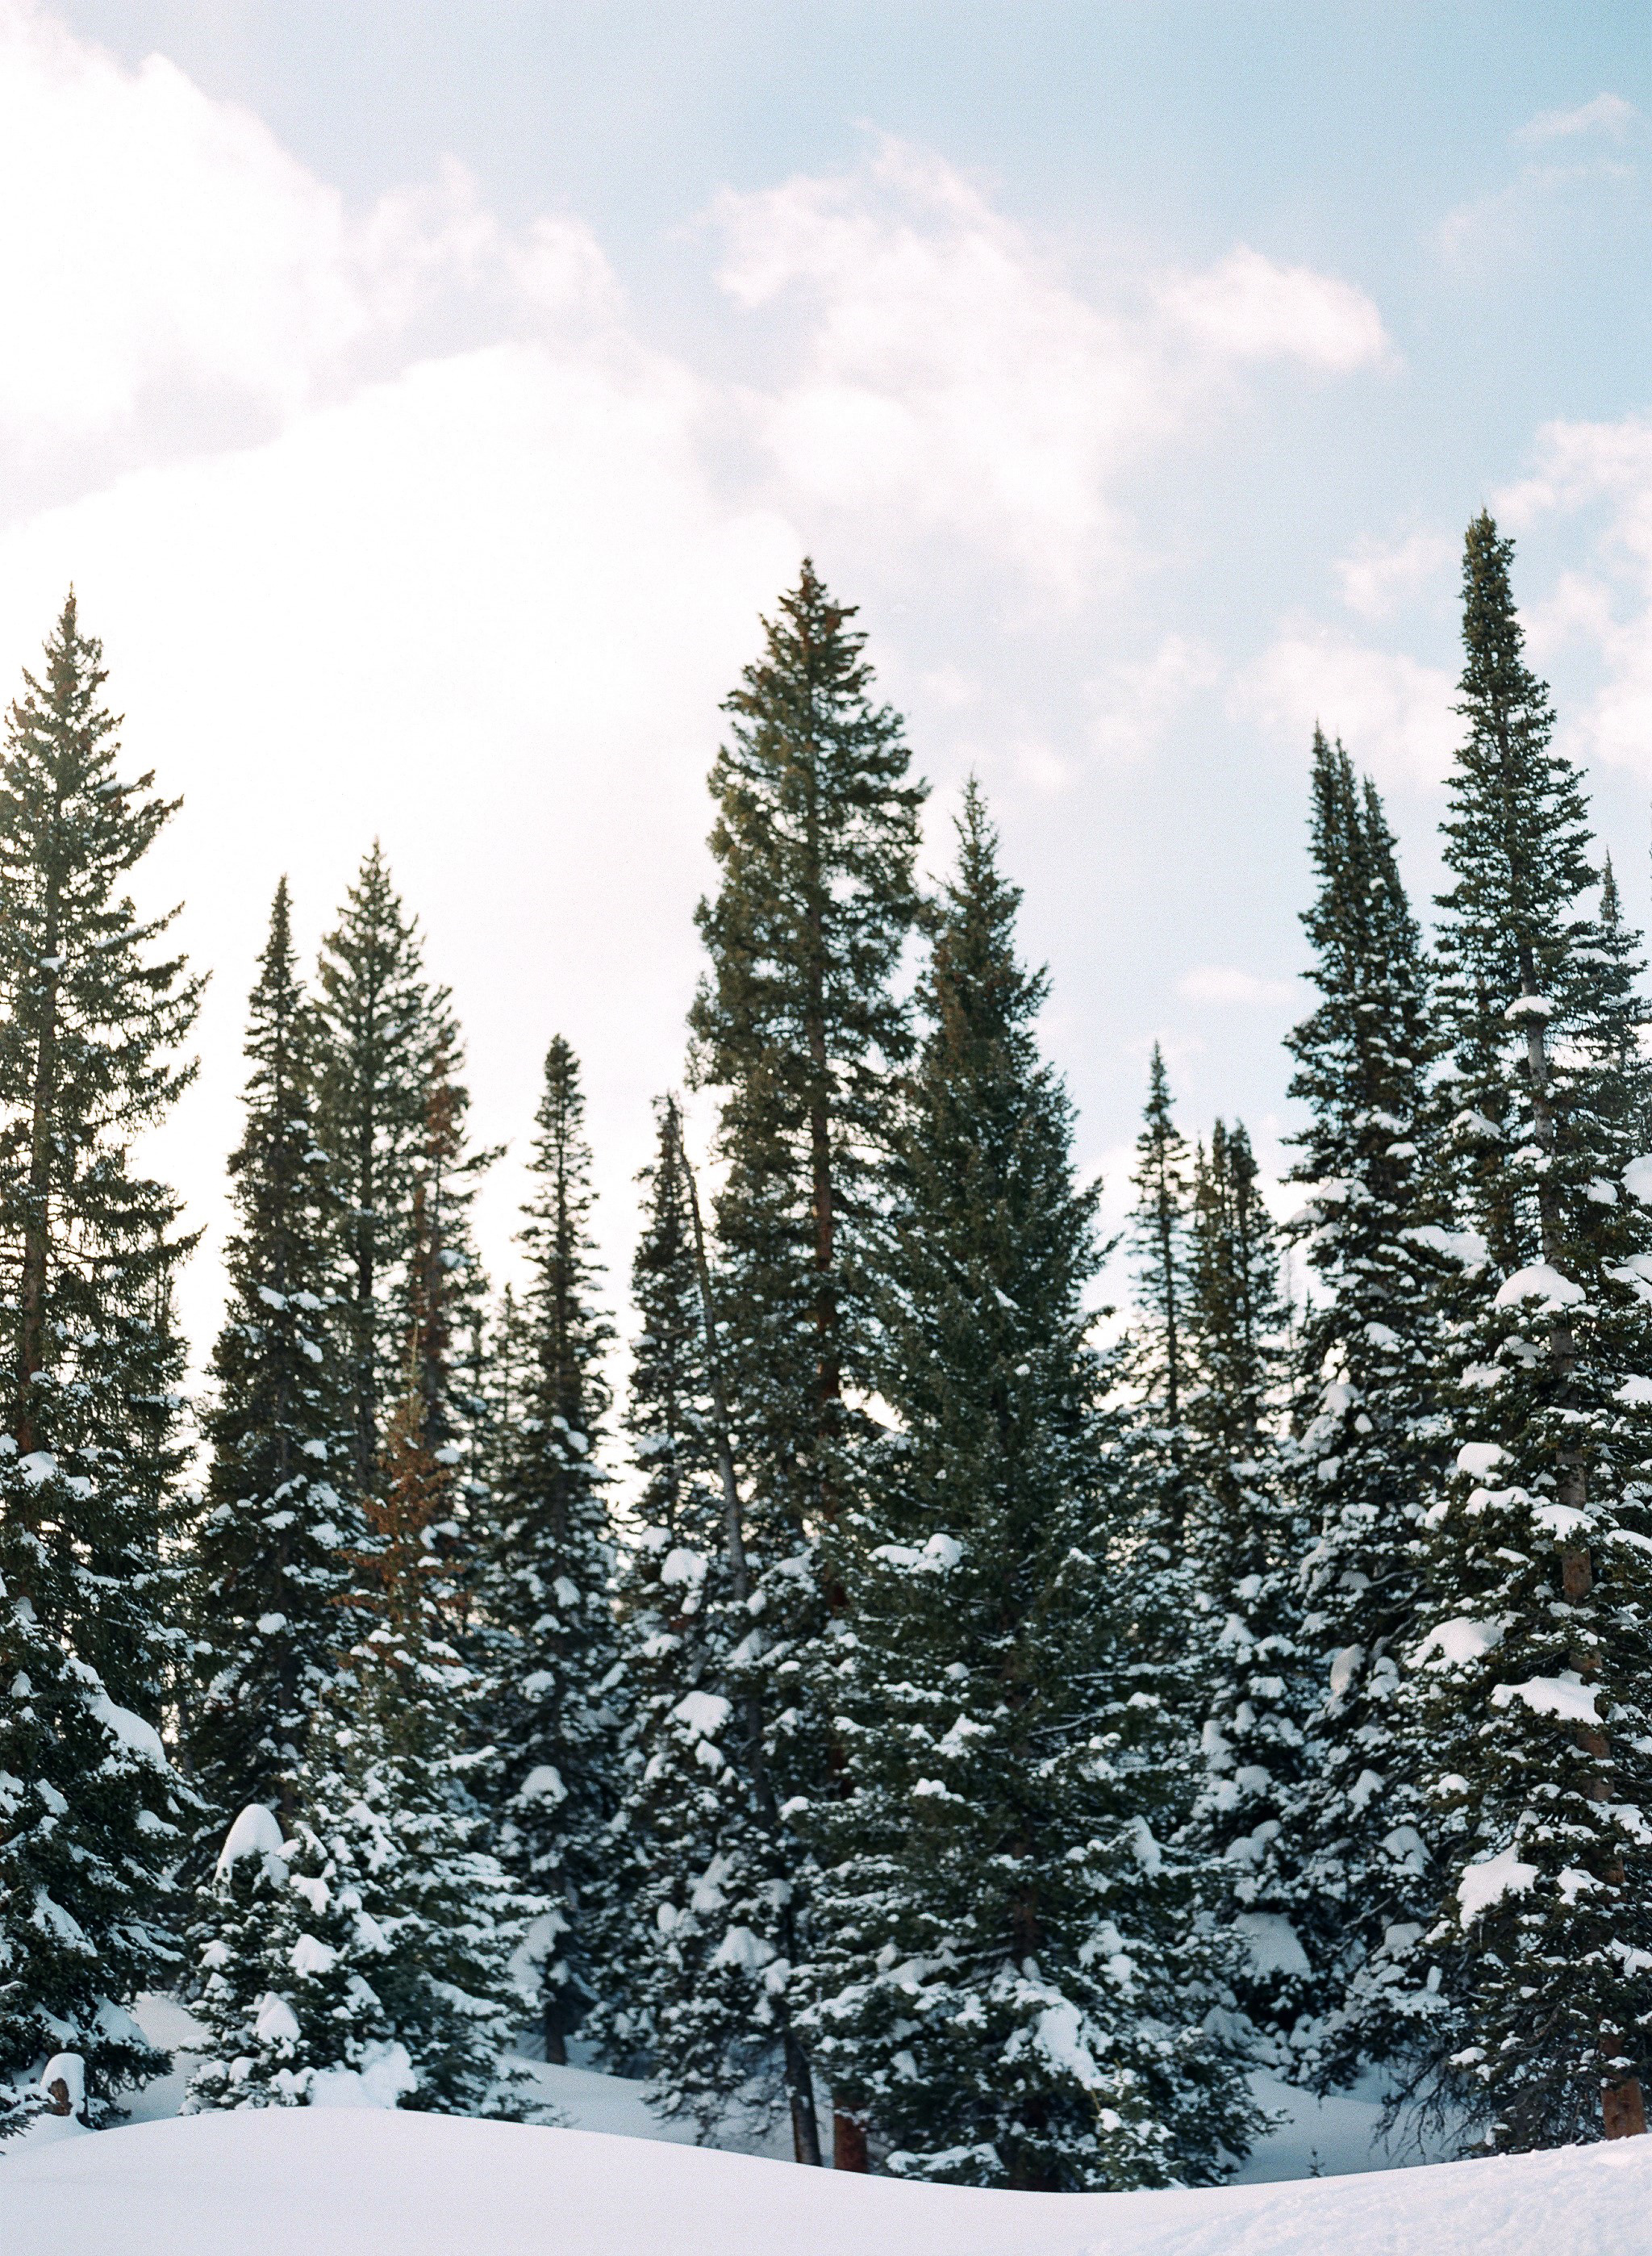 lauramurray-travel-destinationphotography-creativetravel-artists-filmphotography-unearthingtc-trees-snow-pinetrees-snowcappedtrees.jpg